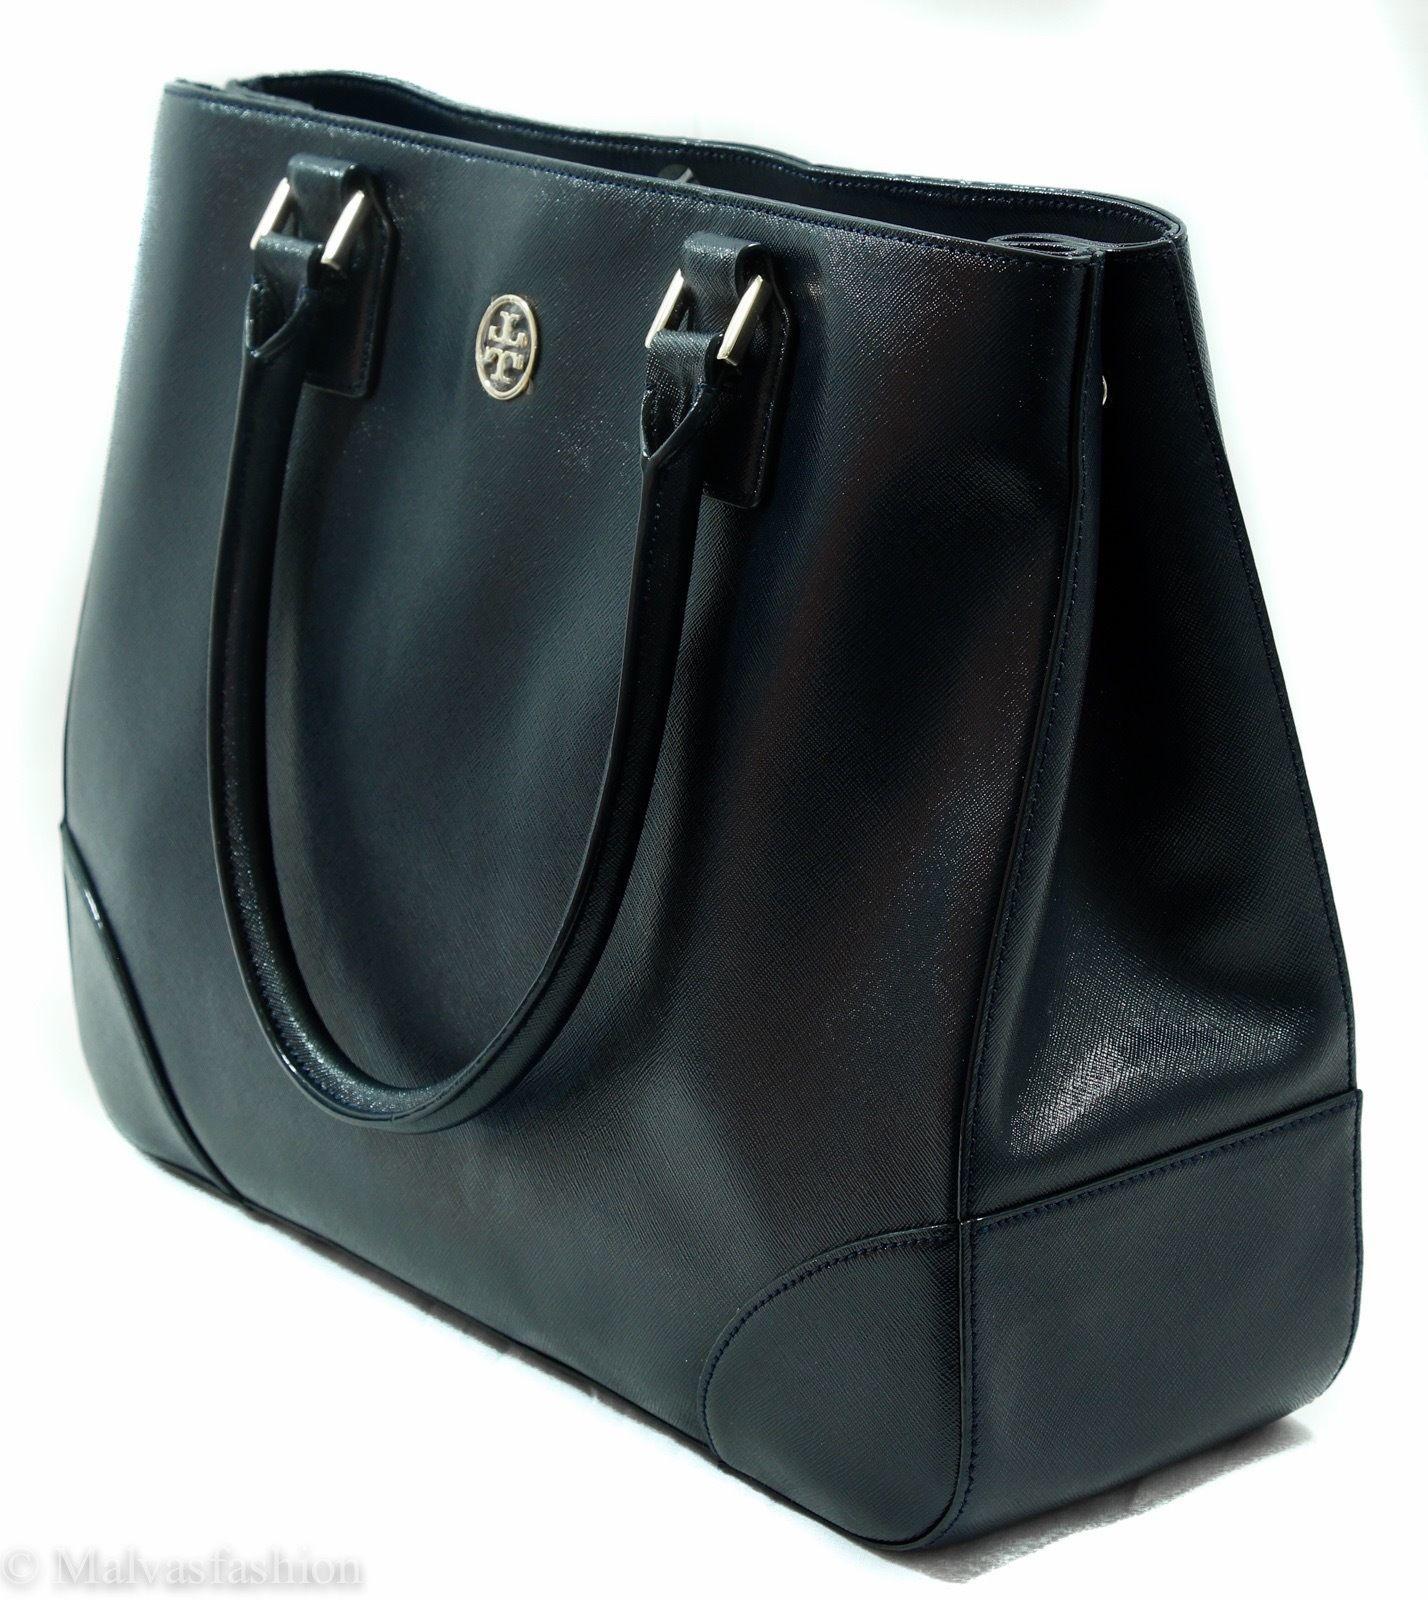 NWTTory Burch Robinson East/West Tote Handbag Bag, Blue image 4